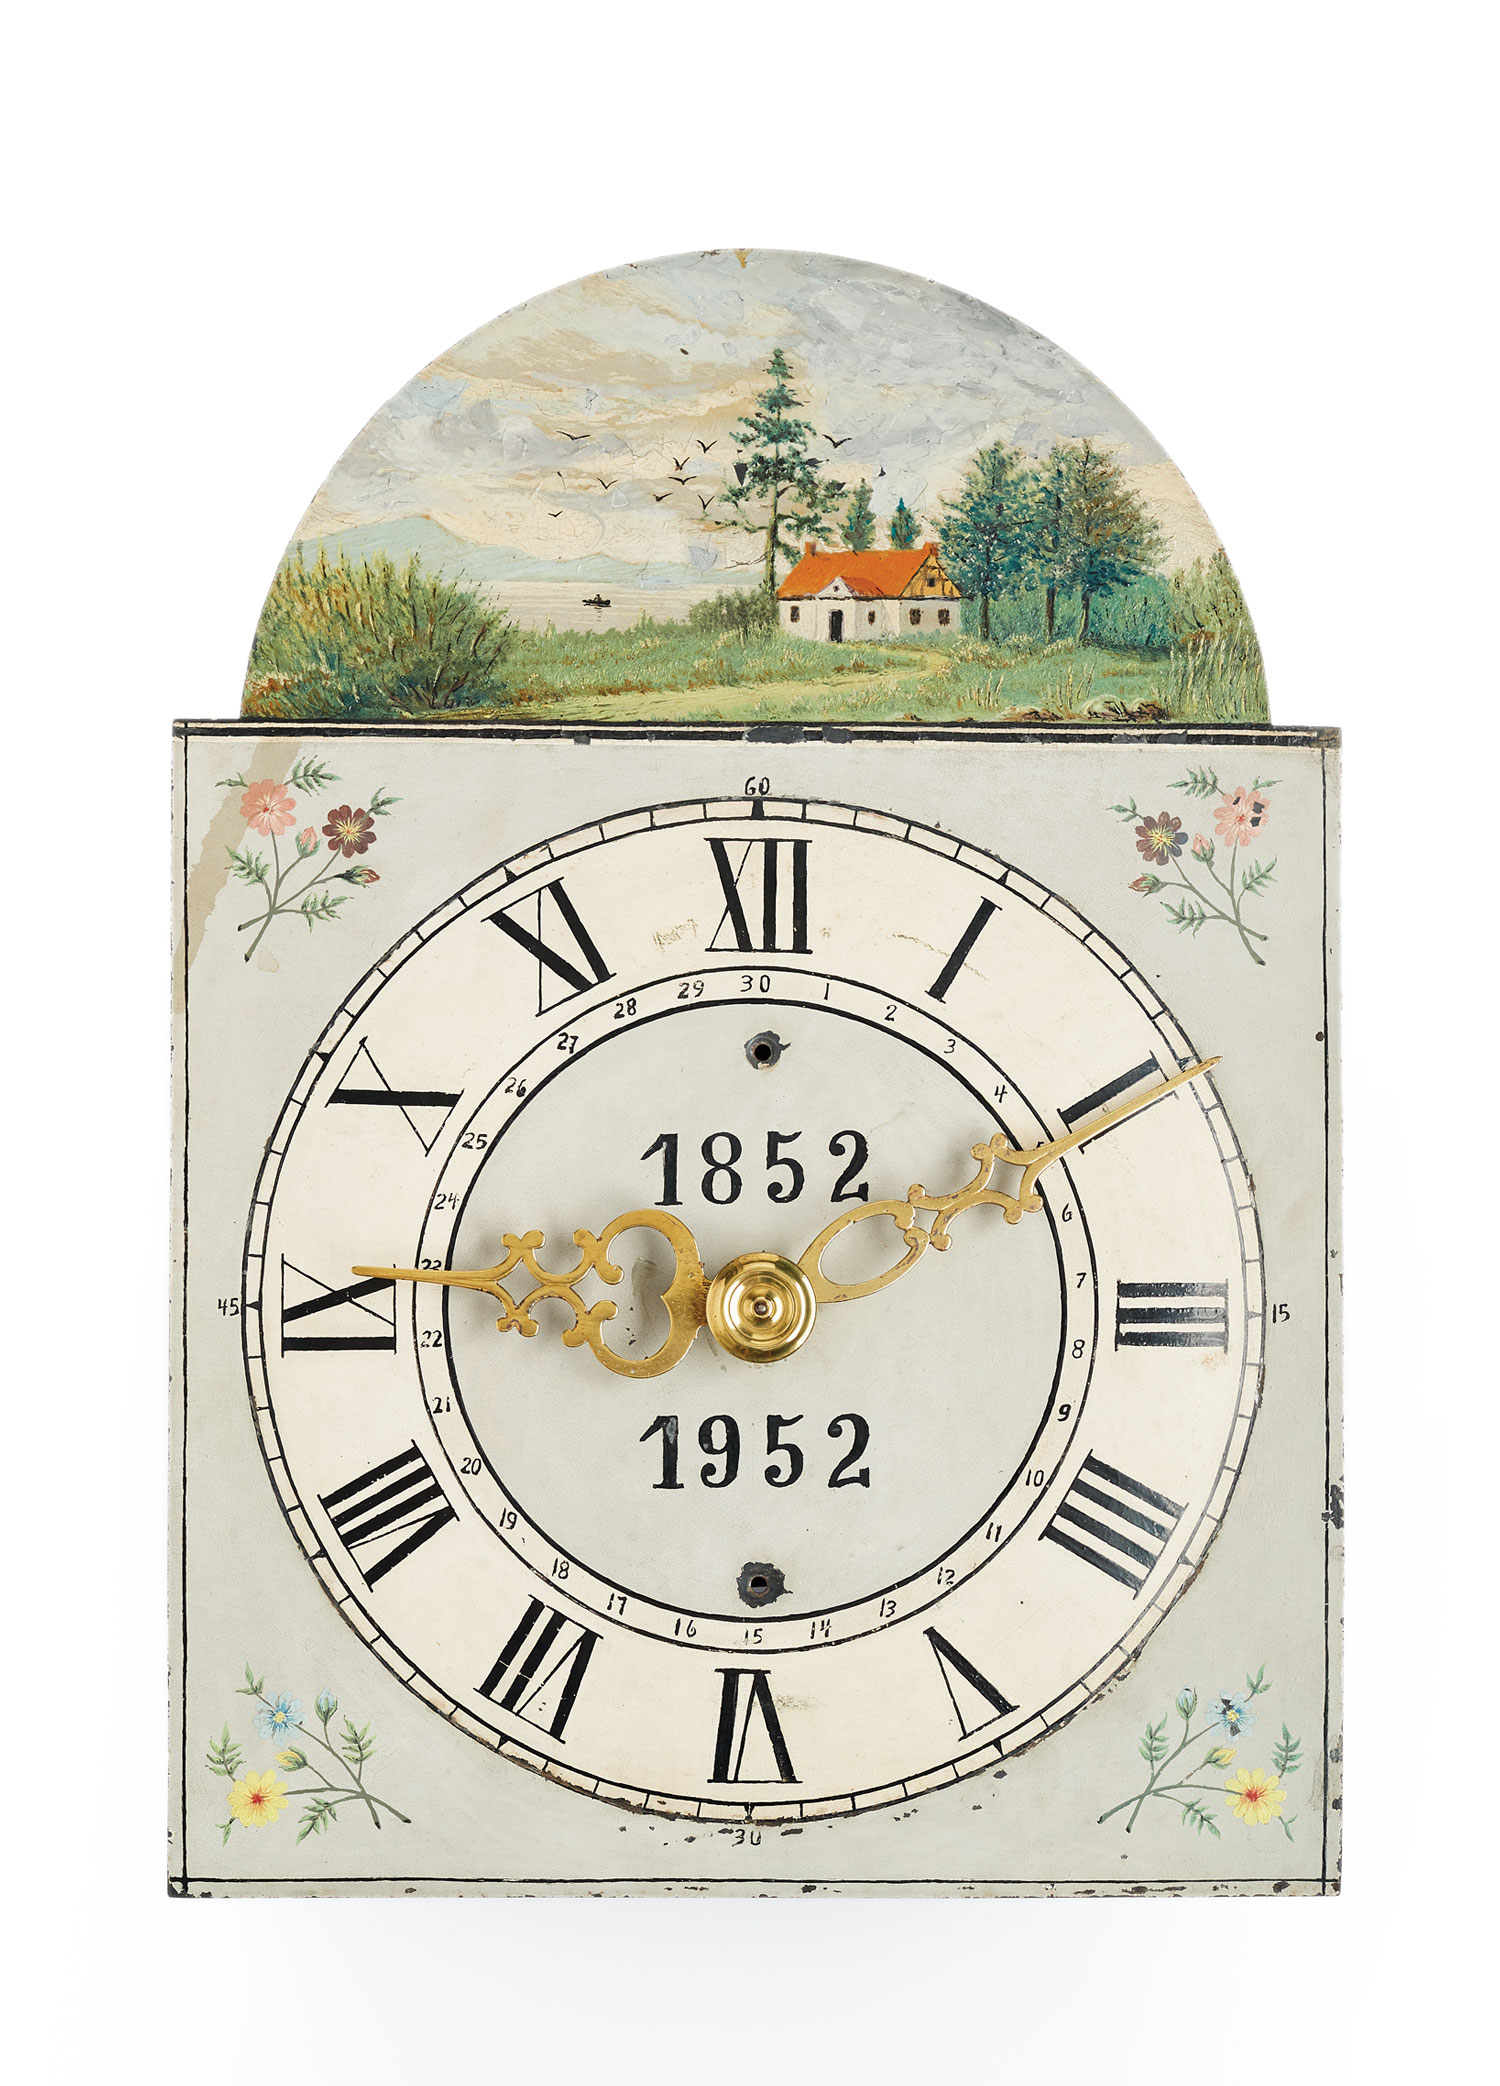 hamm-kroeger-clock-mc0258.jpg